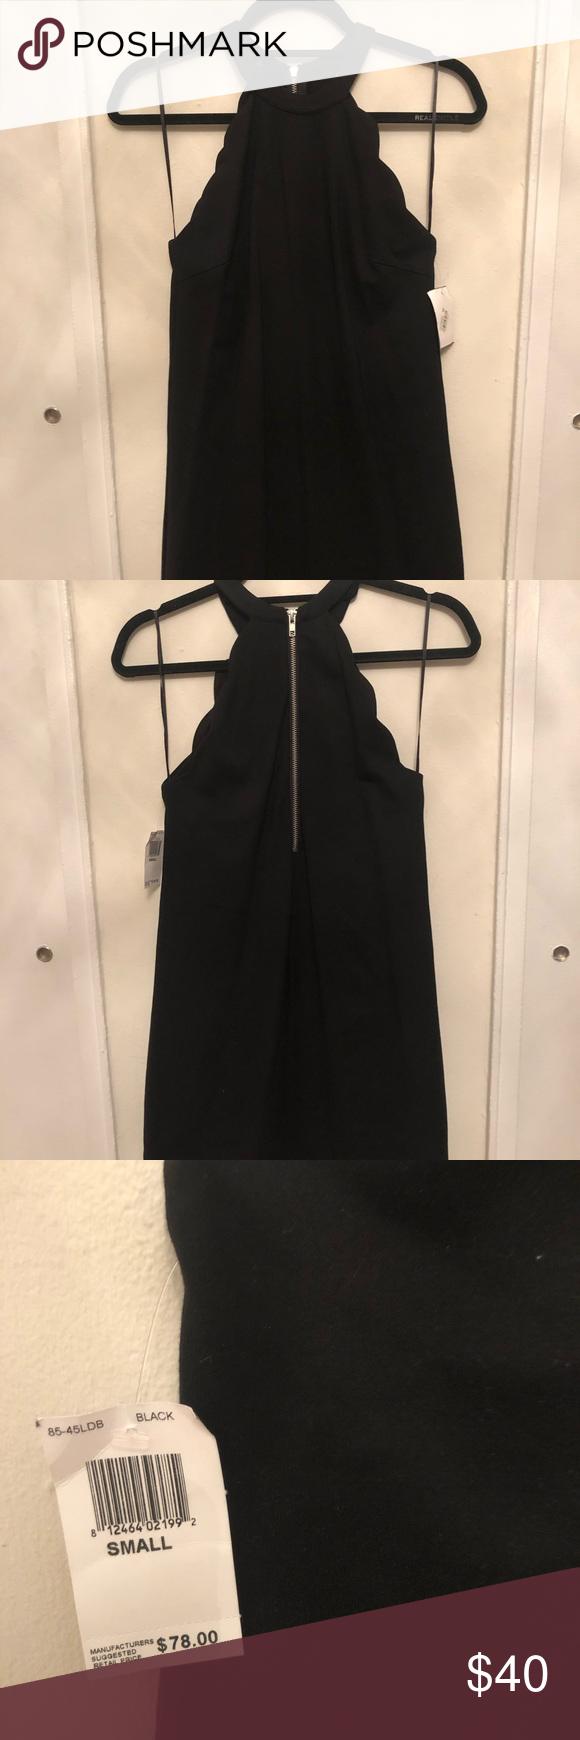 Scalloped Little Black Dress Zipper Back Stretch Material Olivaceous Dresses Mini Little Black Dress Black Dress Olivaceous Dress [ 1740 x 580 Pixel ]